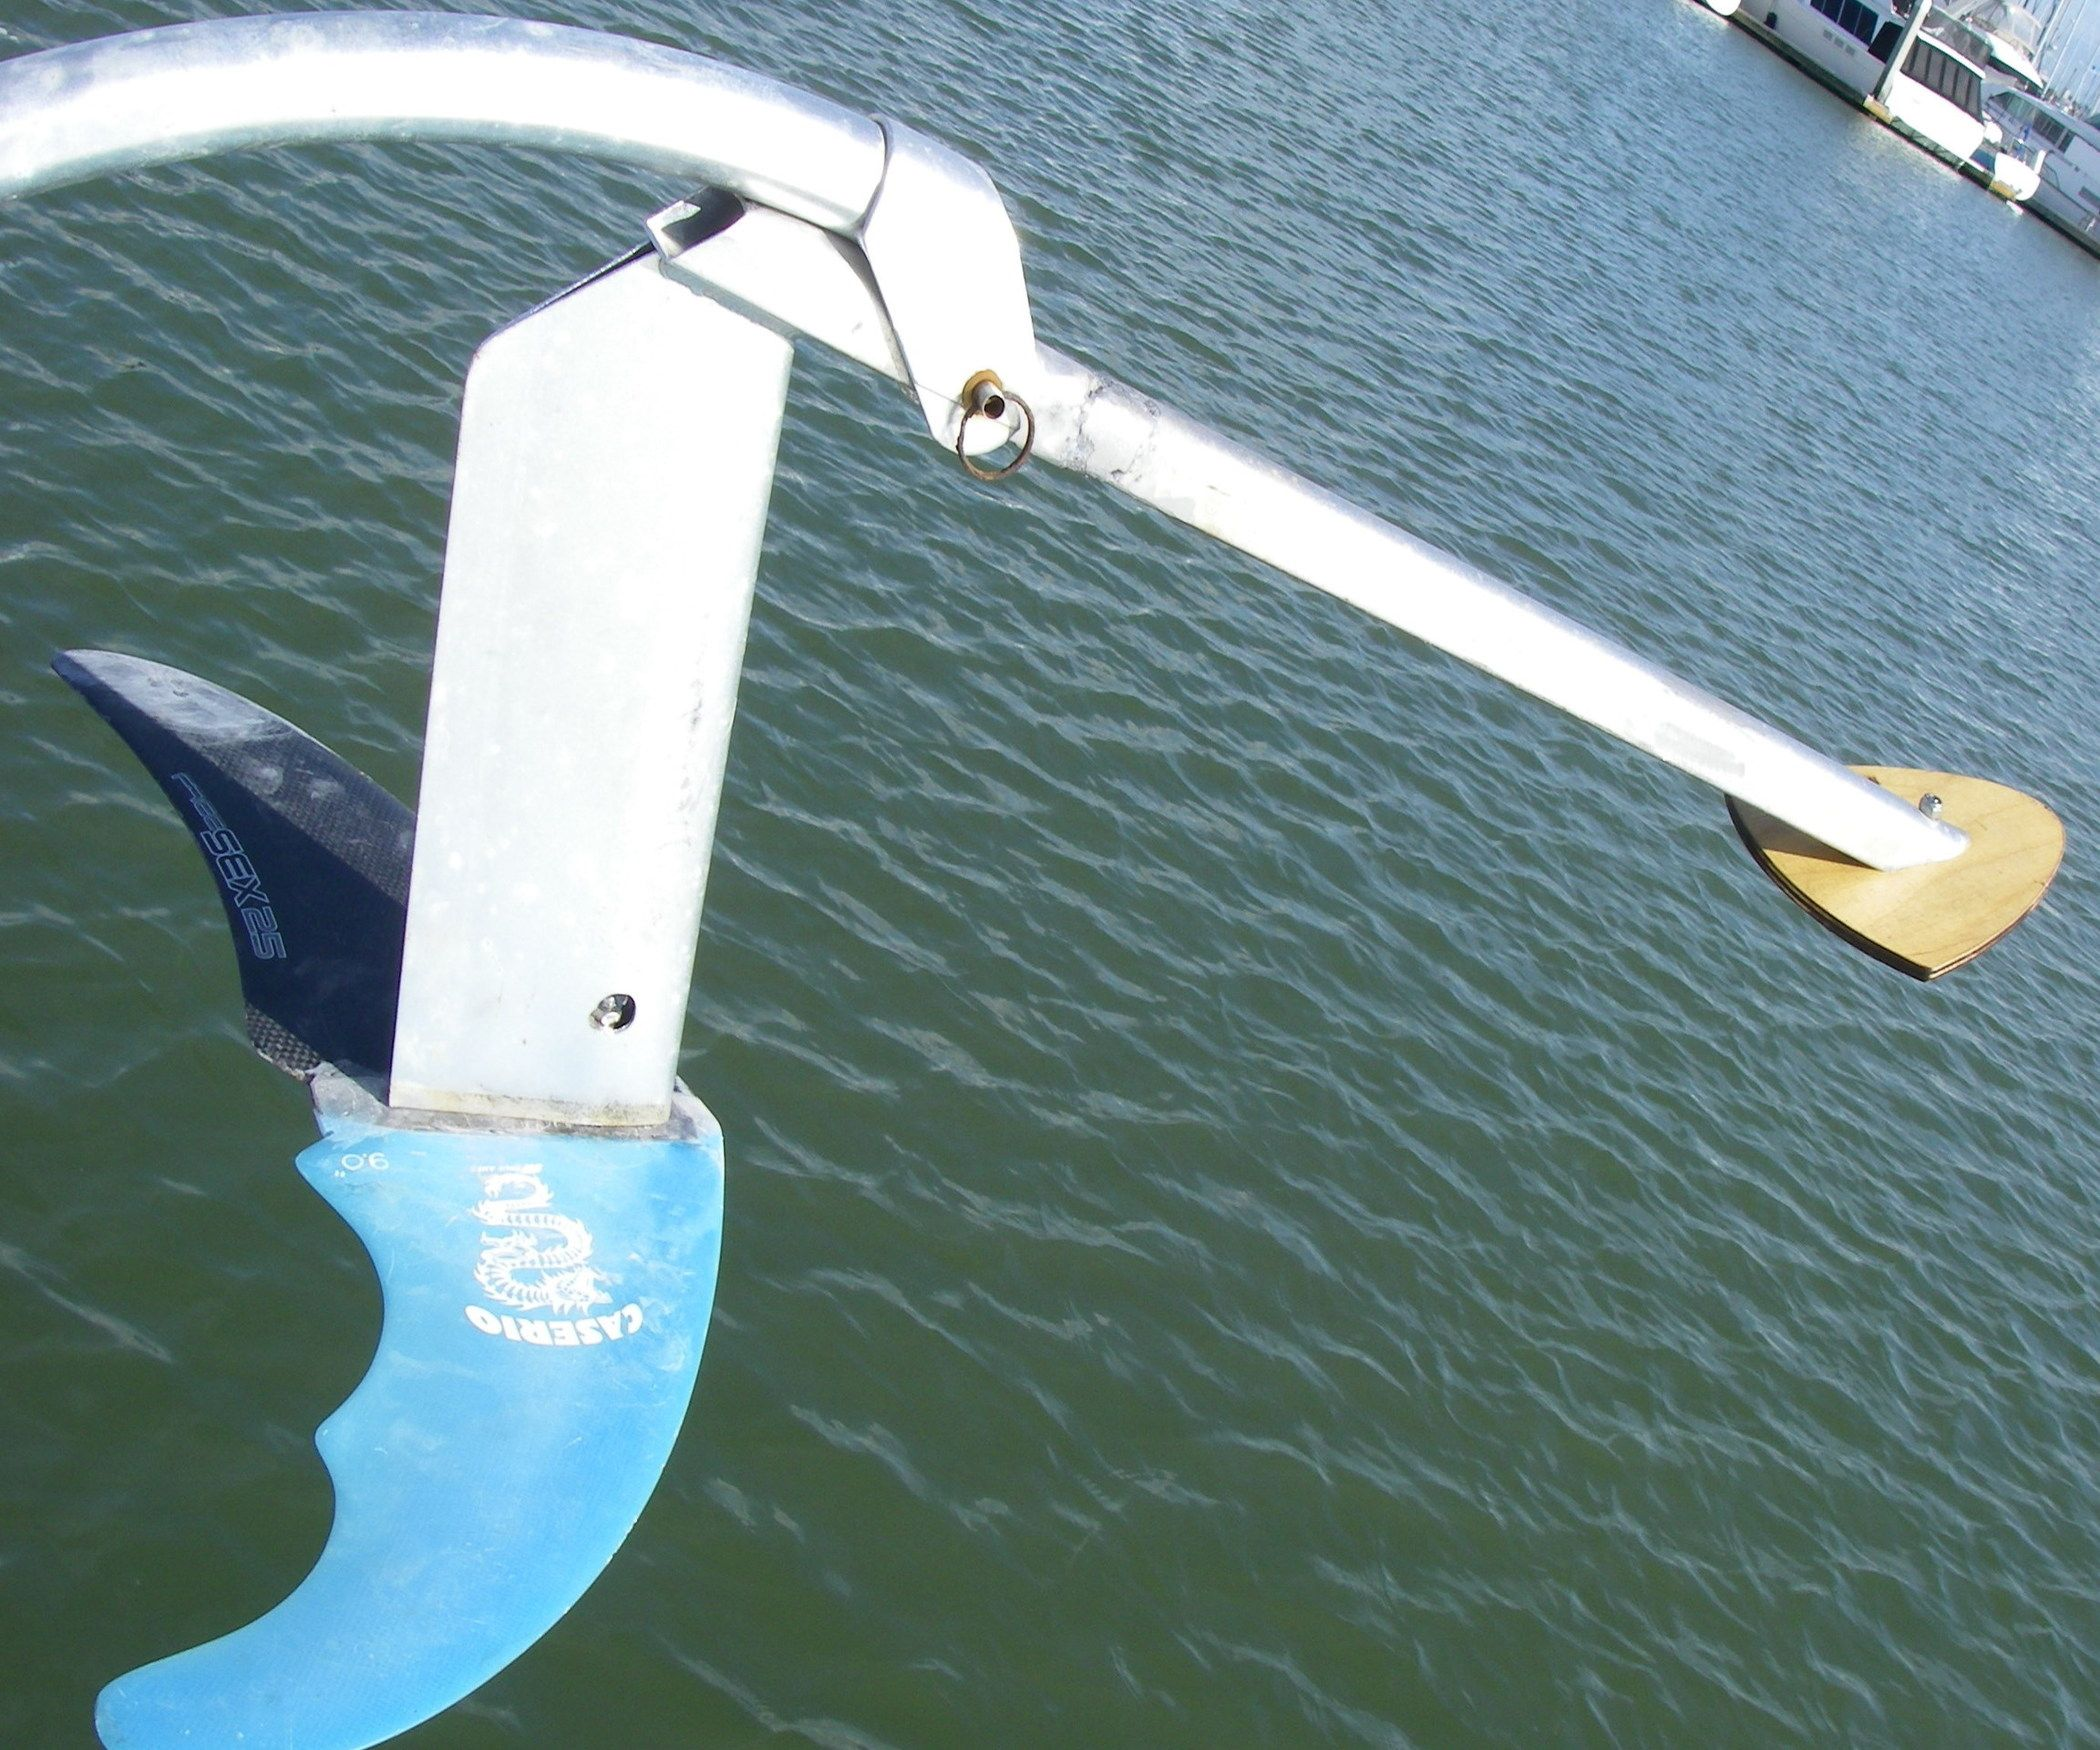 Make a Hydrofoil Blade From Windsurfer Fins Windsurfing